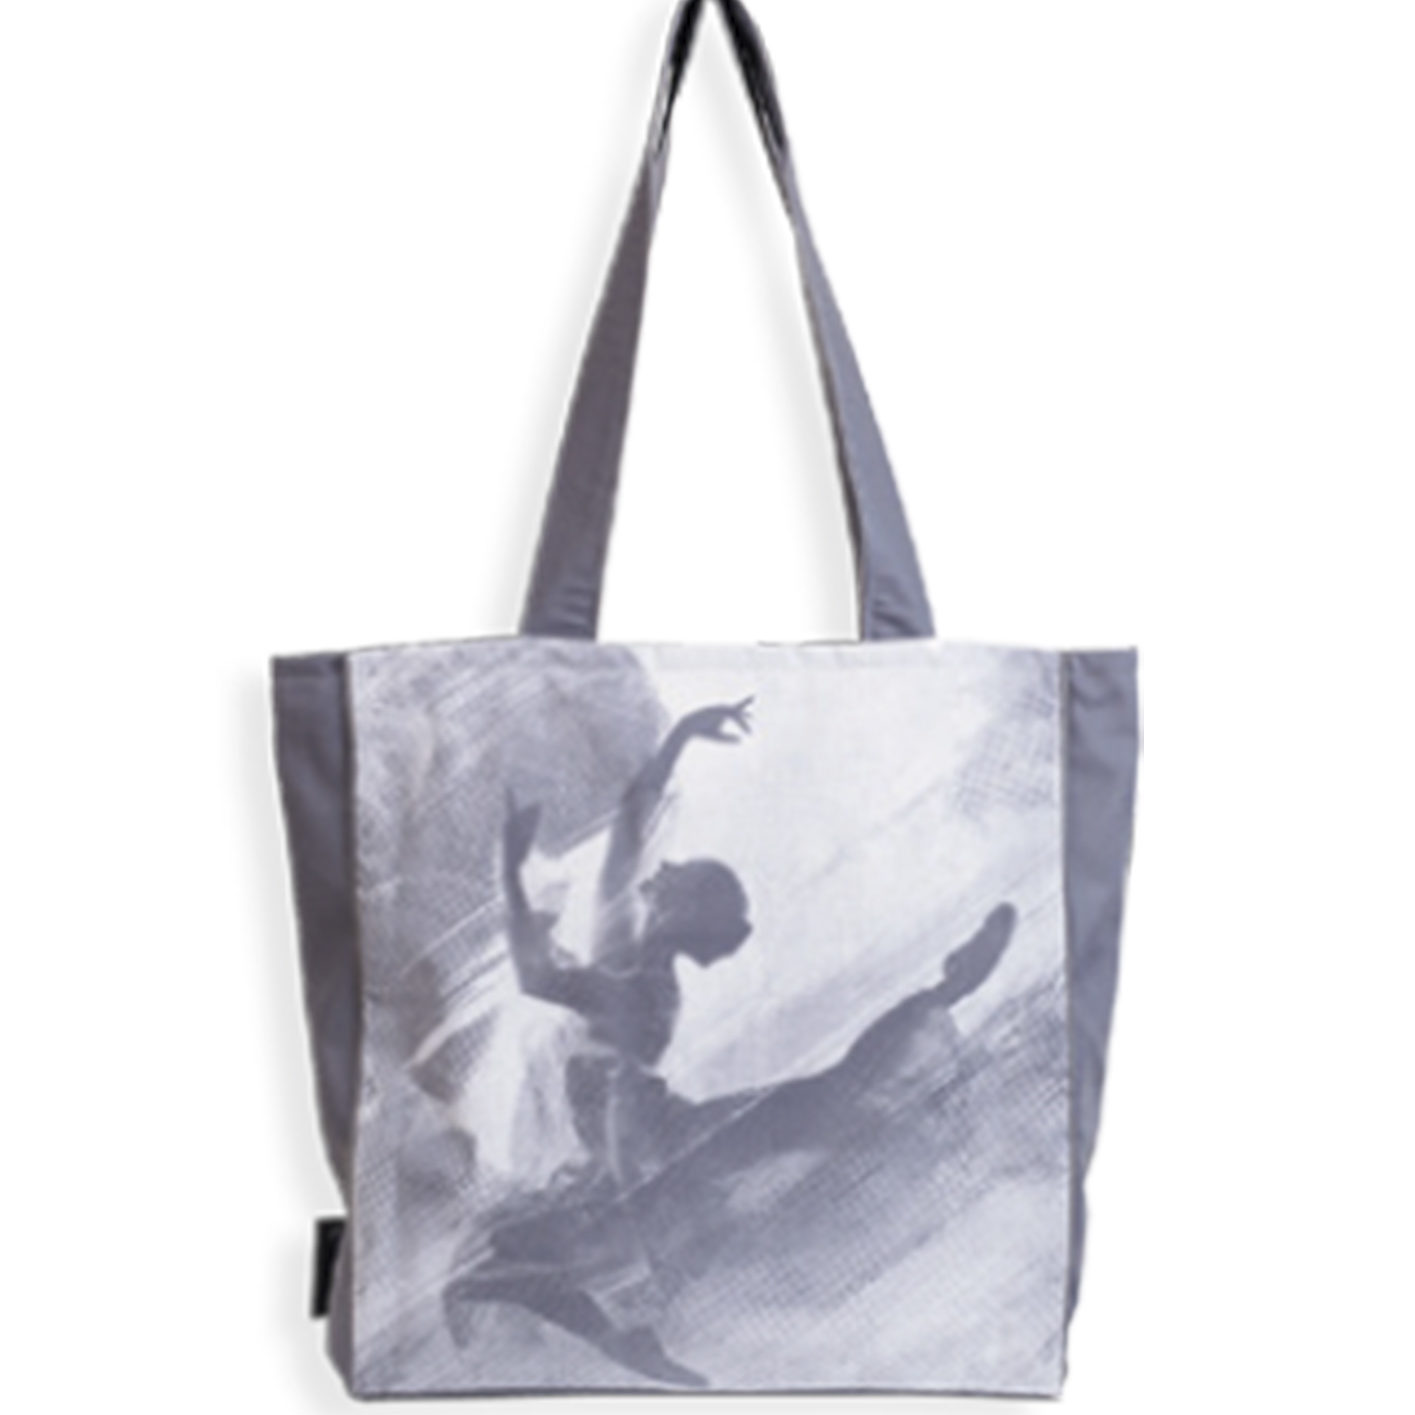 BOLSA 9007, sac de danse INTERMEZZO, dance bag intermezzo, Danceworld Bruxelles